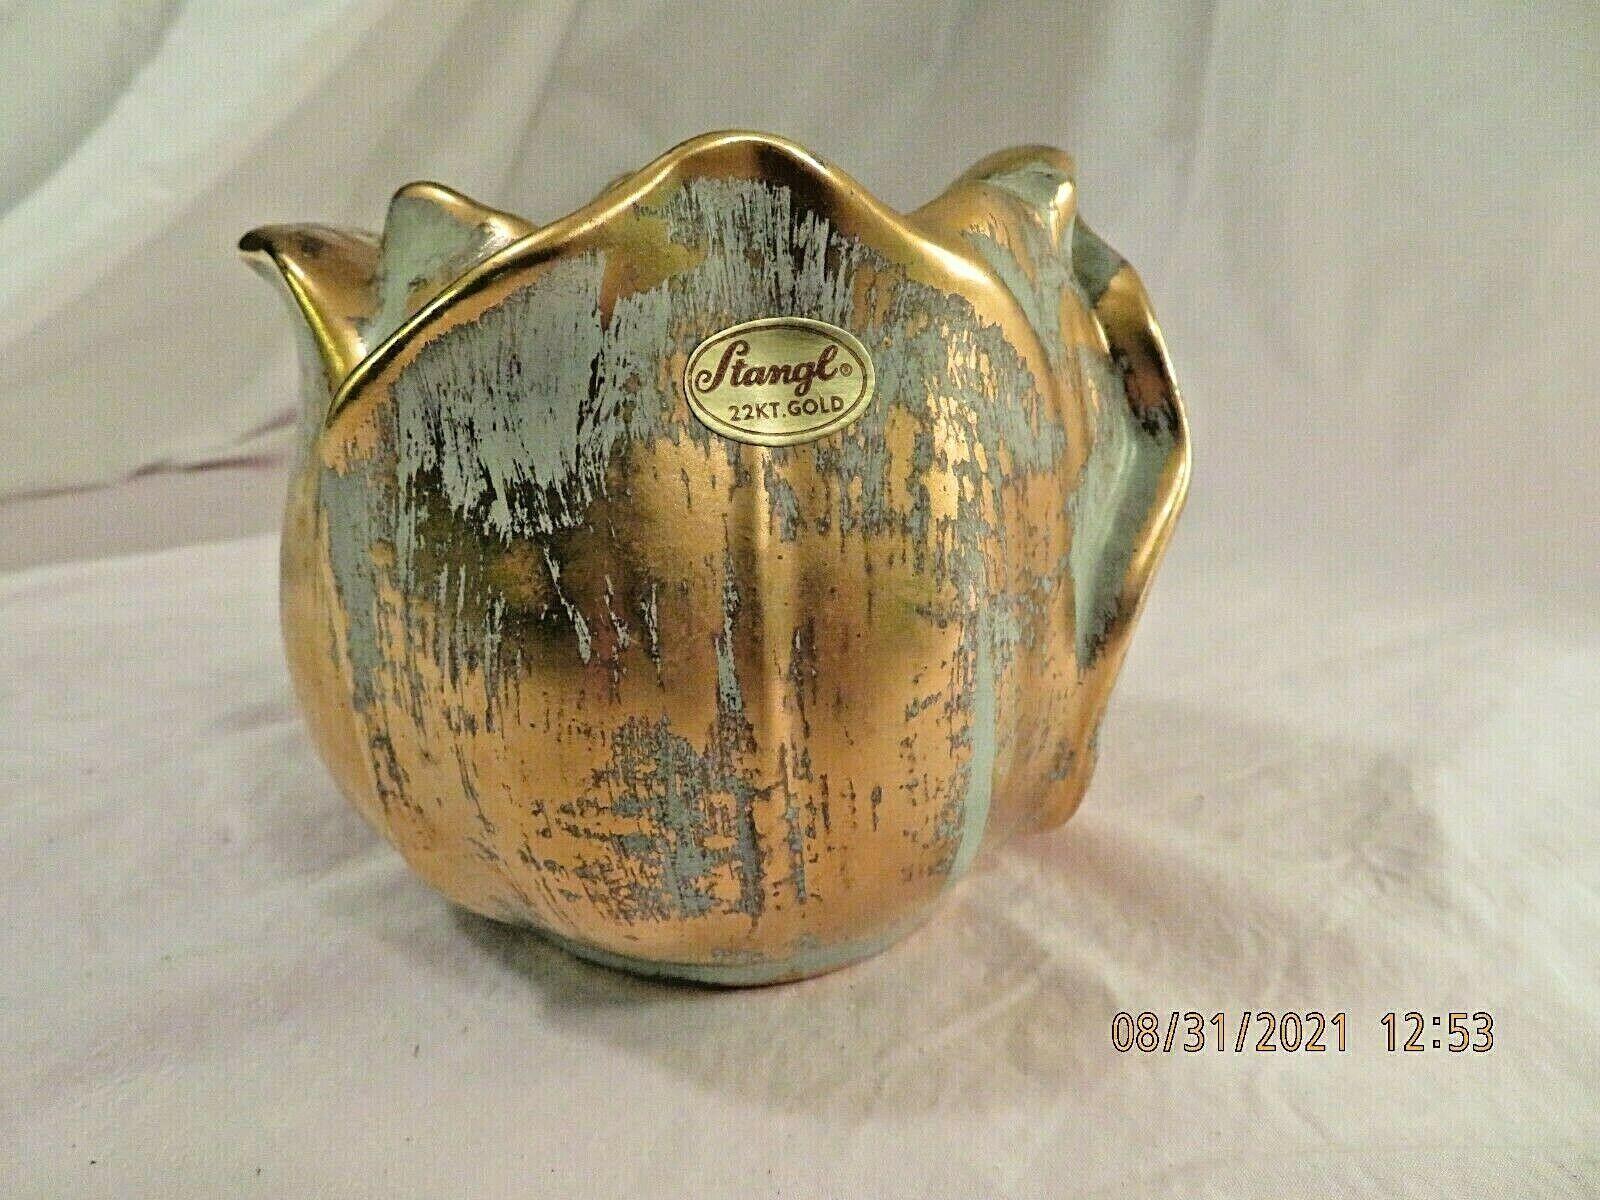 Vtg Stangl Art Pottery Tulip Vase 5144 Hand Painted 22K Gold Washed W/label - $10.00